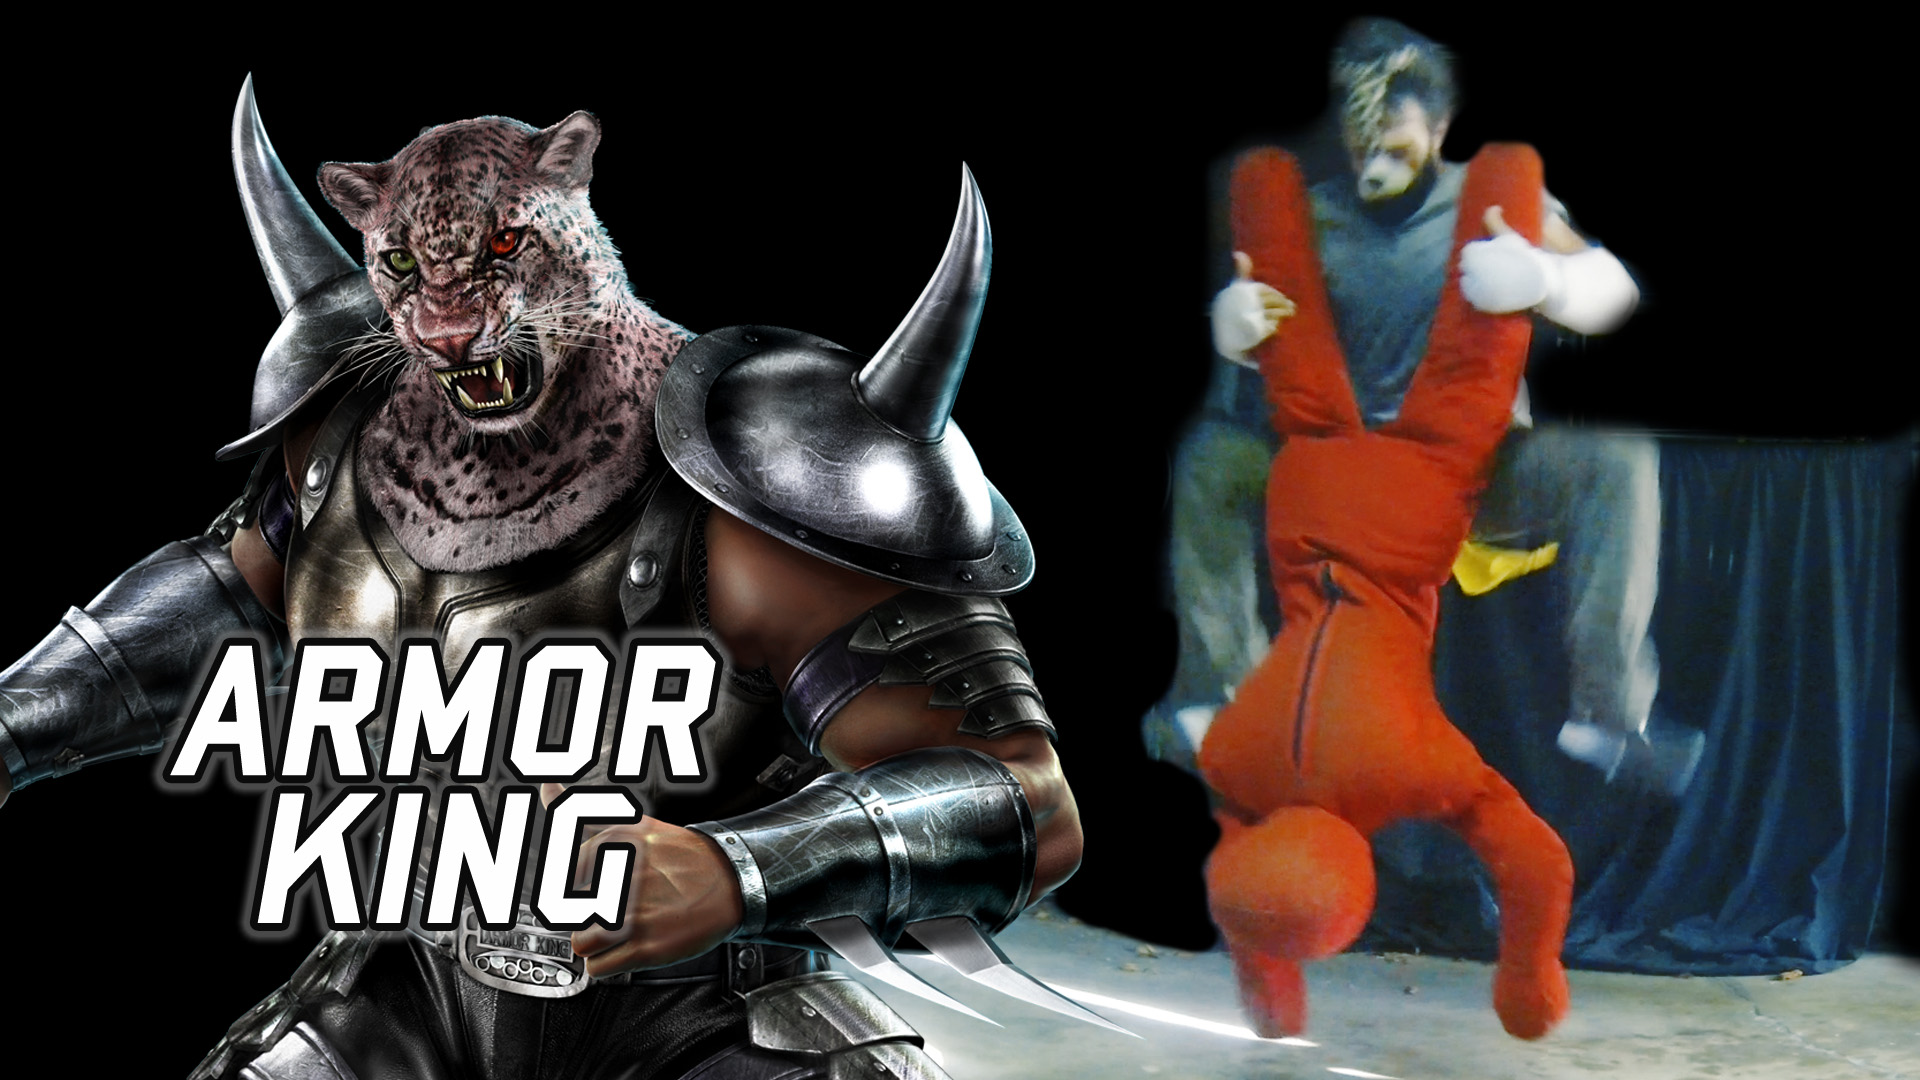 Eric Jacobus Returns To His Tekken Roots As Armor King Eric Jacobus